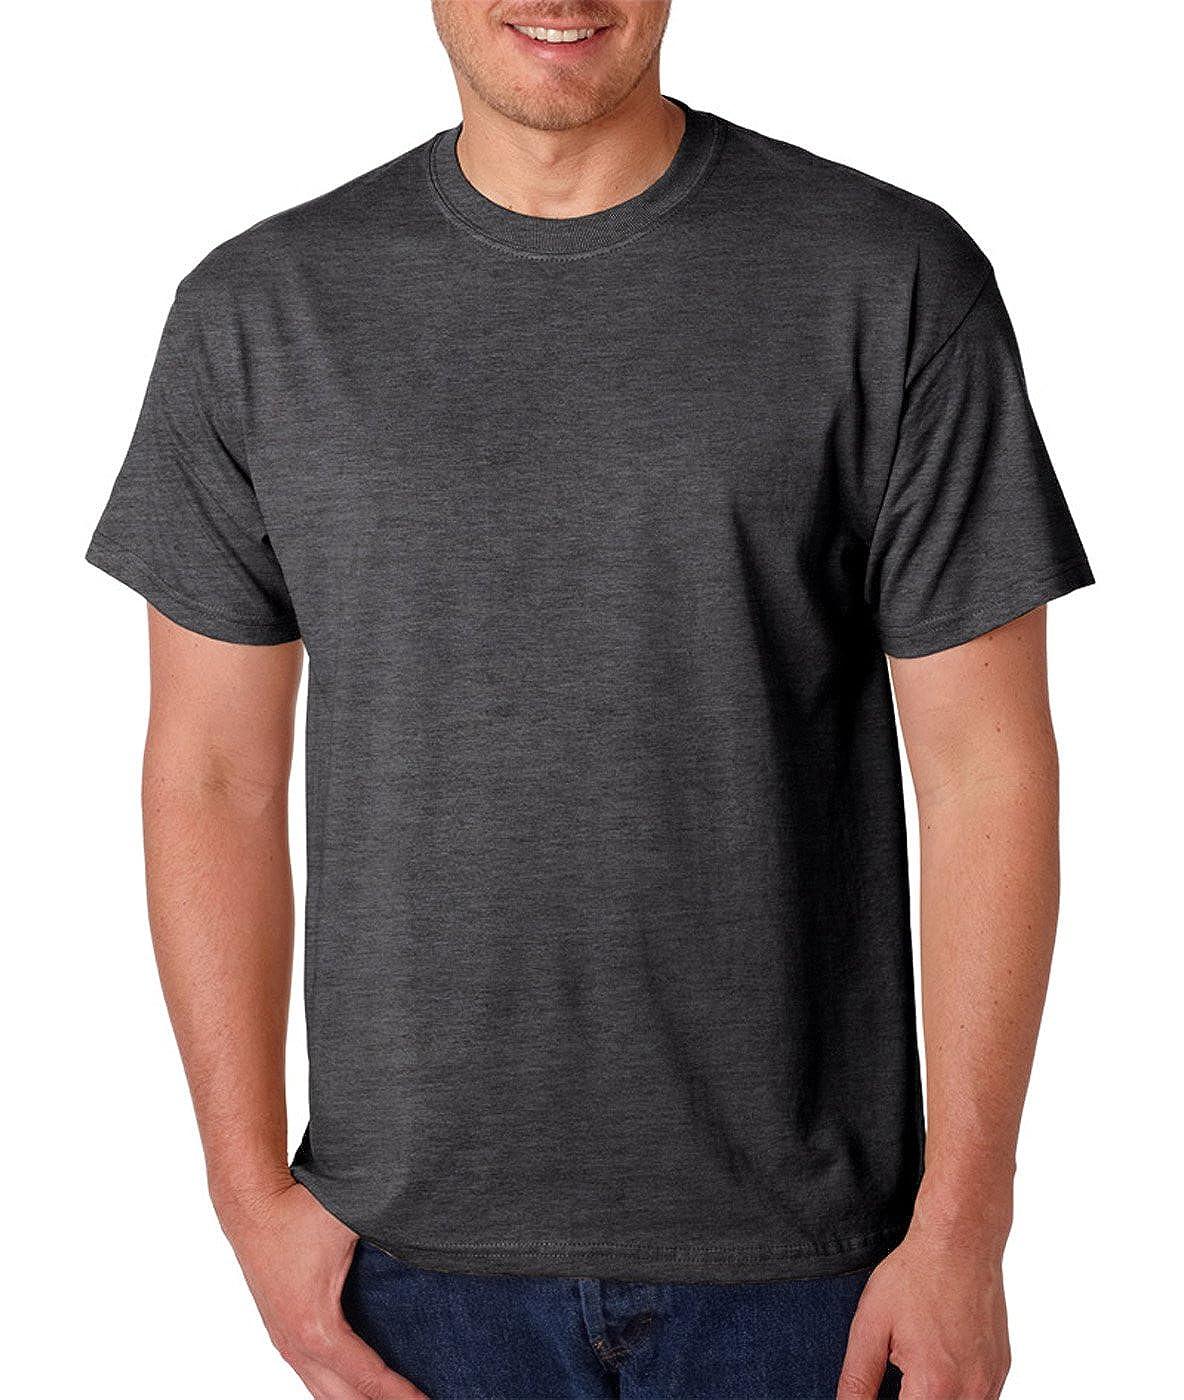 -DARK HEATH -L-12PK 50//50 T-Shirt G800 Gildan Mens DryBlend 5.6 oz.